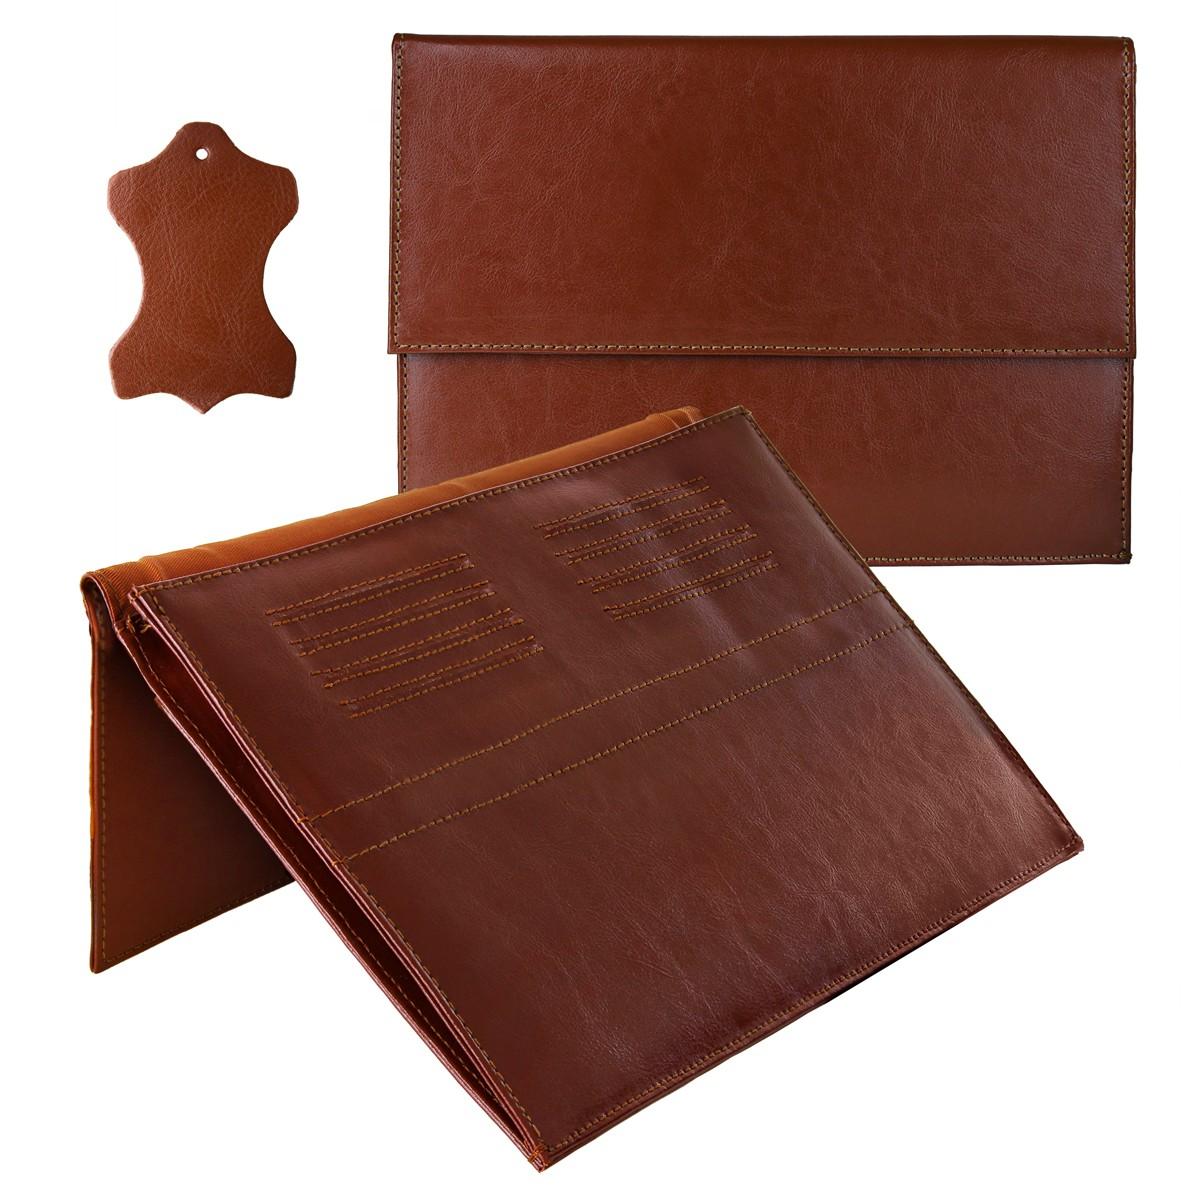 efabrik sleeve f r silvercrest 2in1 tablet 10 1 zoll 3g schutz case h lle zubeh r cover tasche. Black Bedroom Furniture Sets. Home Design Ideas